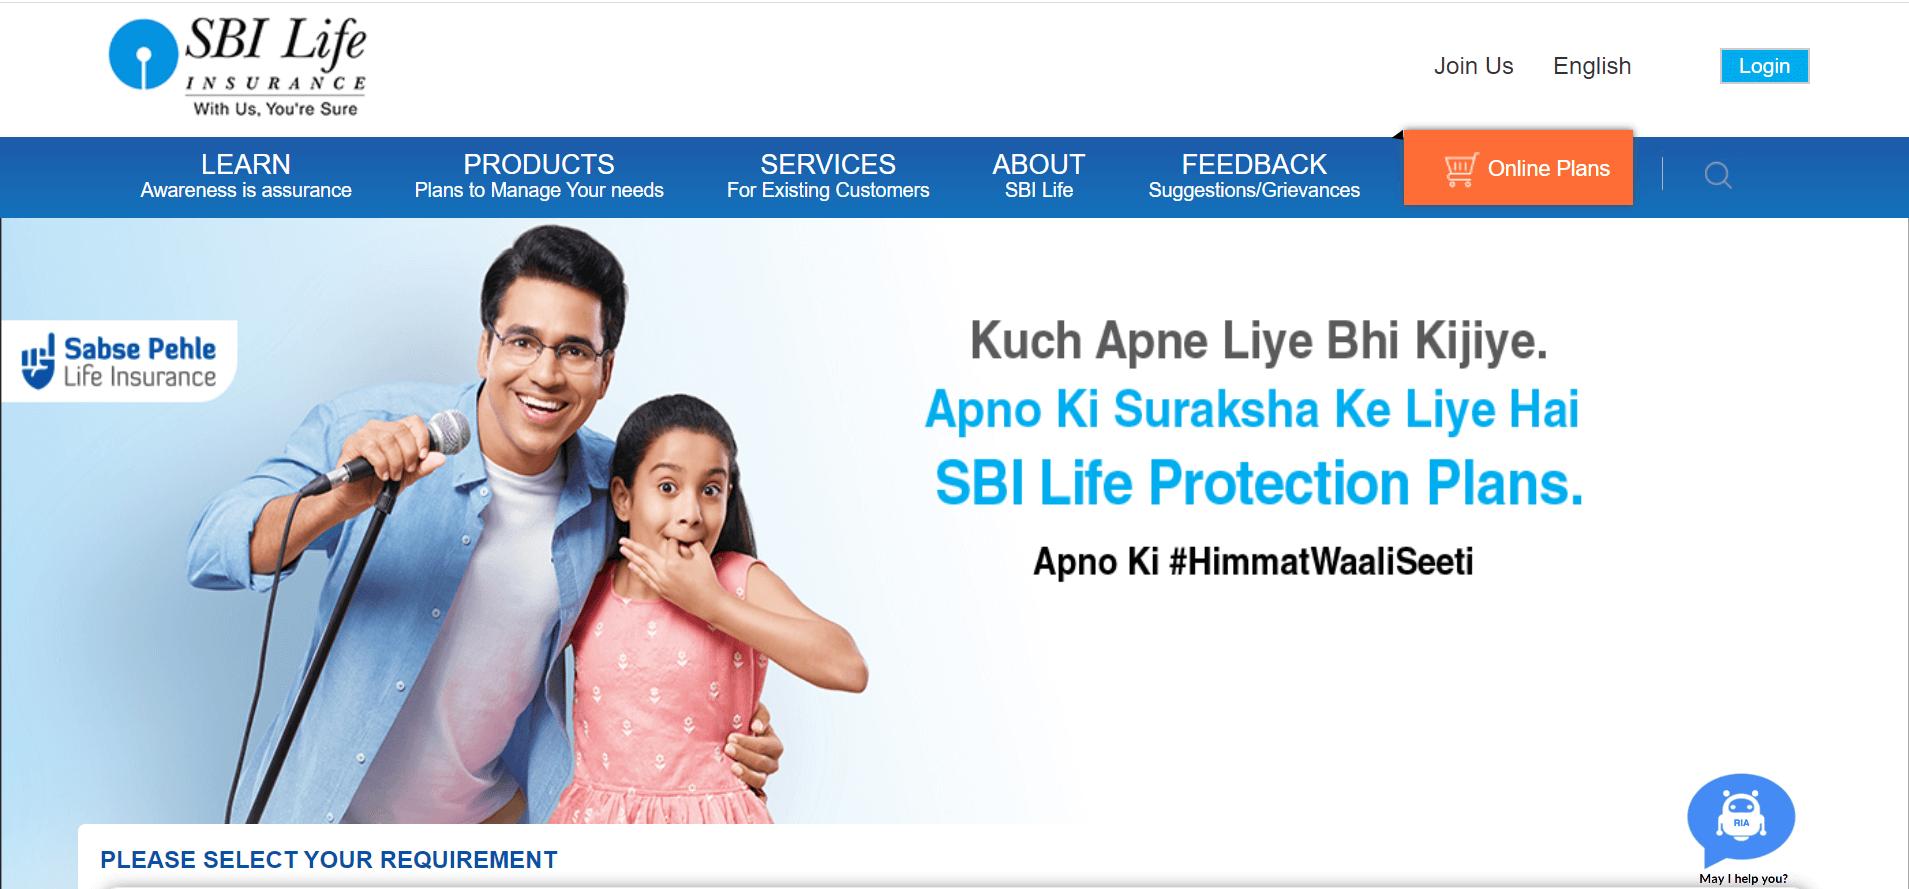 SBI LifeSmart Health Insurance Plan